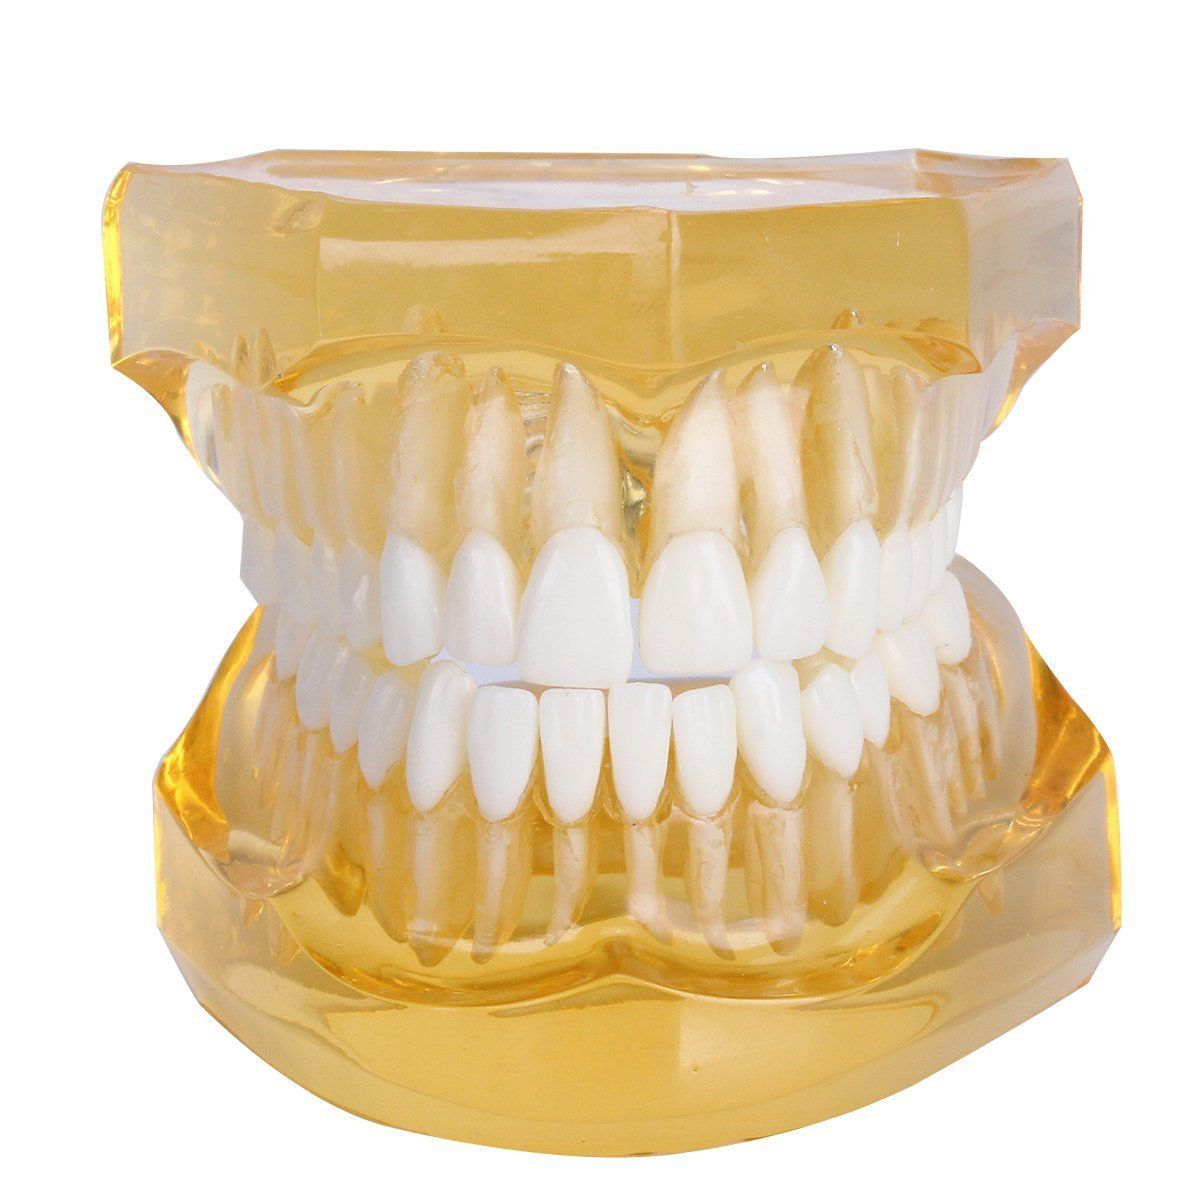 Dental Removable Teeth Model Adult Typodont Model for Dentist (Color Orange) soarday children primary teeth alternating transparent model dental root clearly displayed dentist patient communication